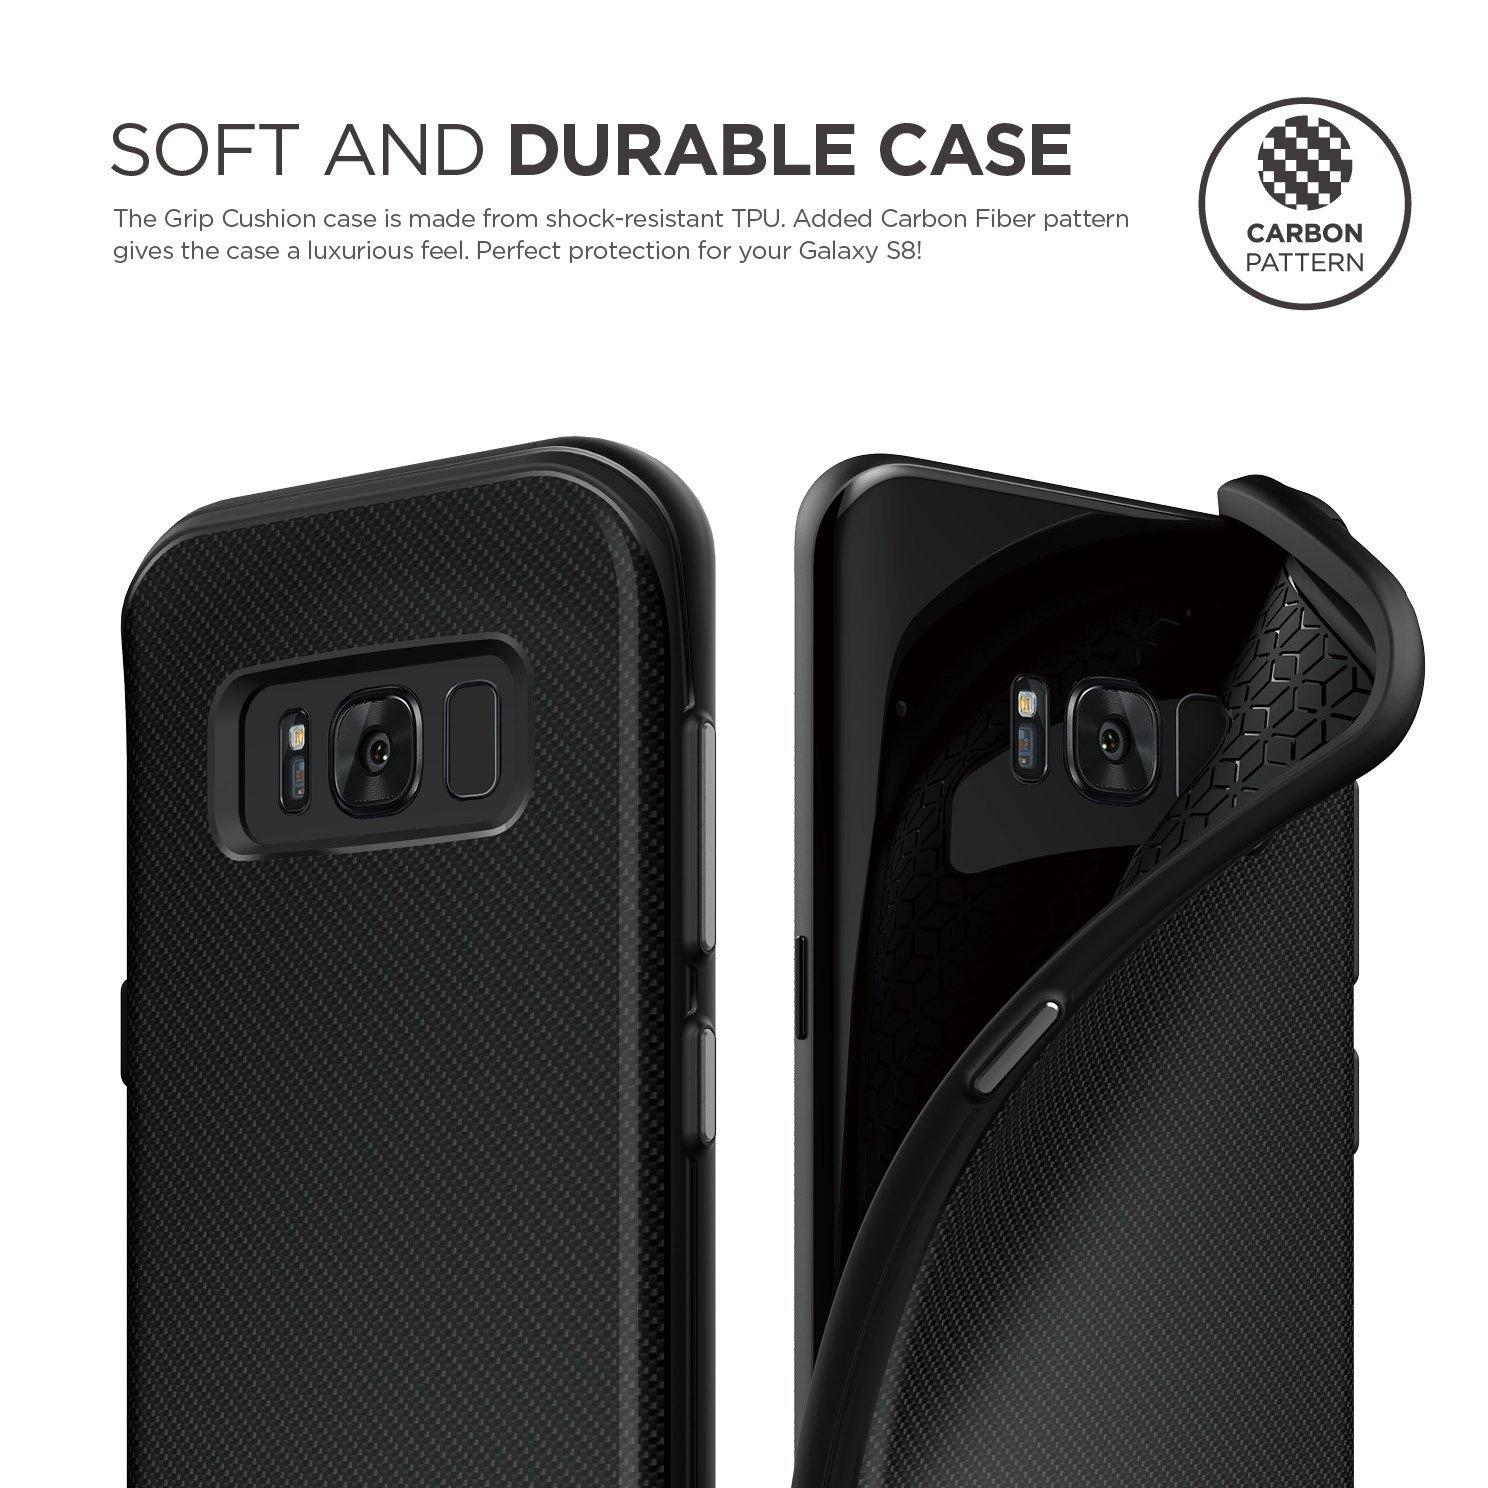 on sale 91103 84b8e Grip Cushion Case for Galaxy S8 Plus - Black « Back